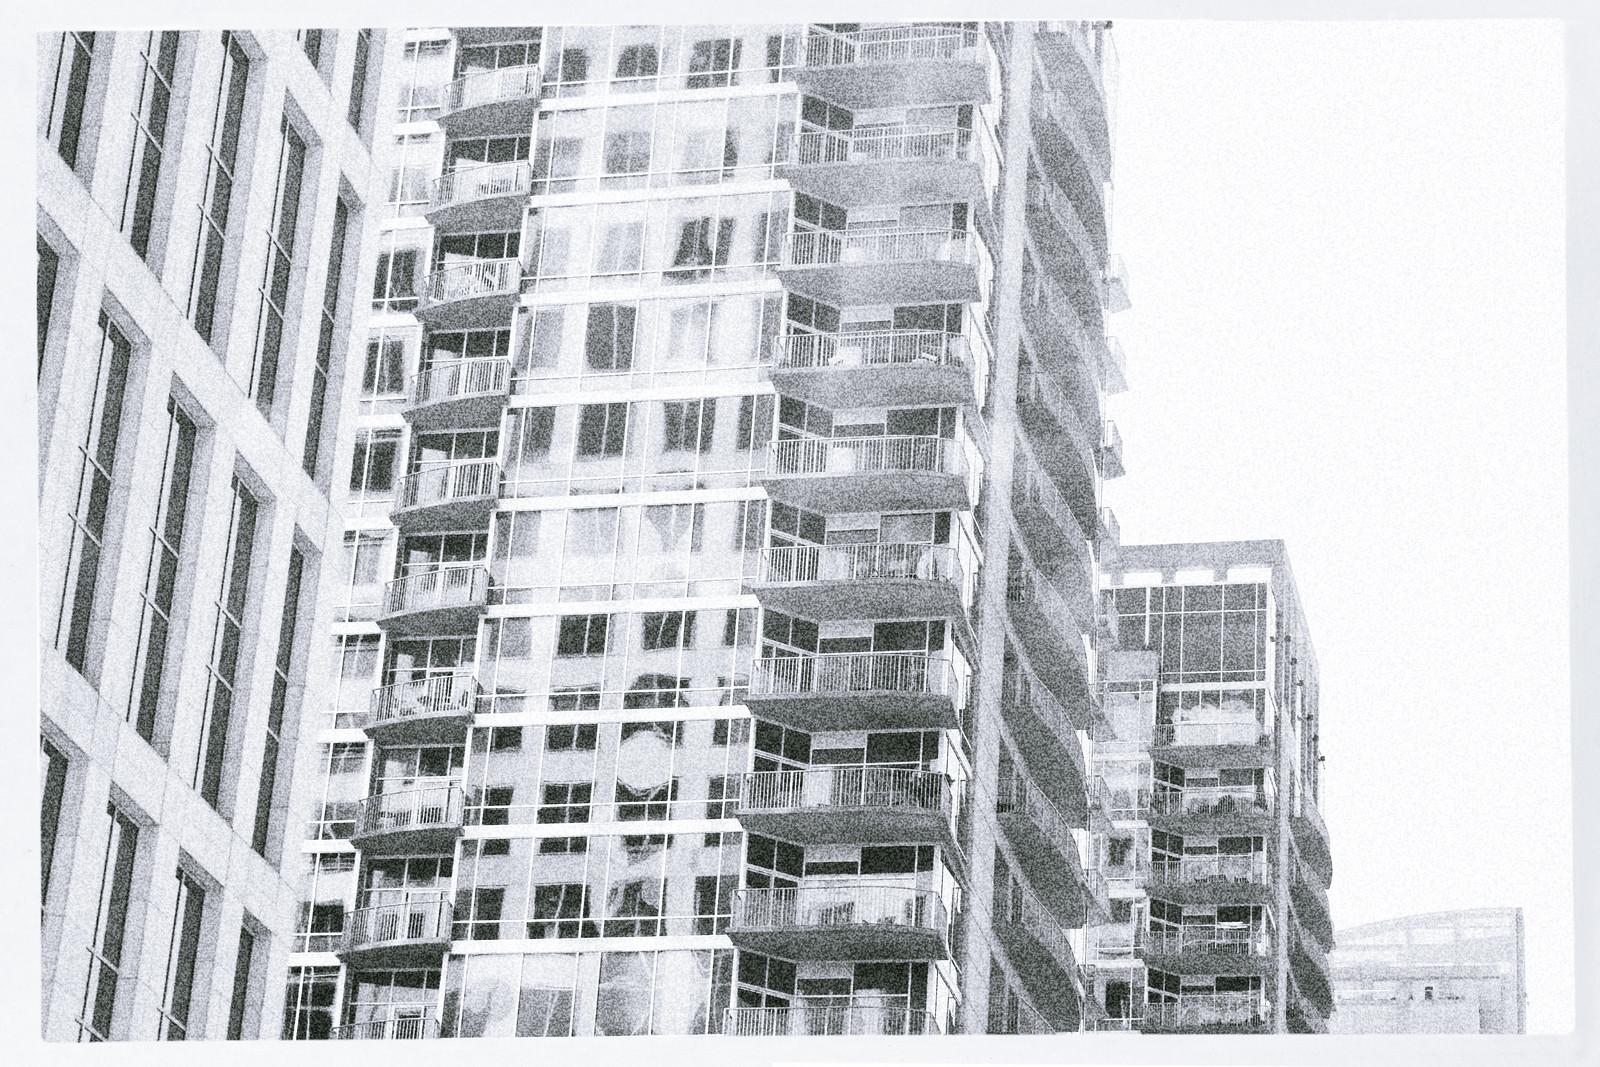 Looking from 999 Peachtree Street building toward 8th Street, Midtown's Miracle Mile, Atlanta